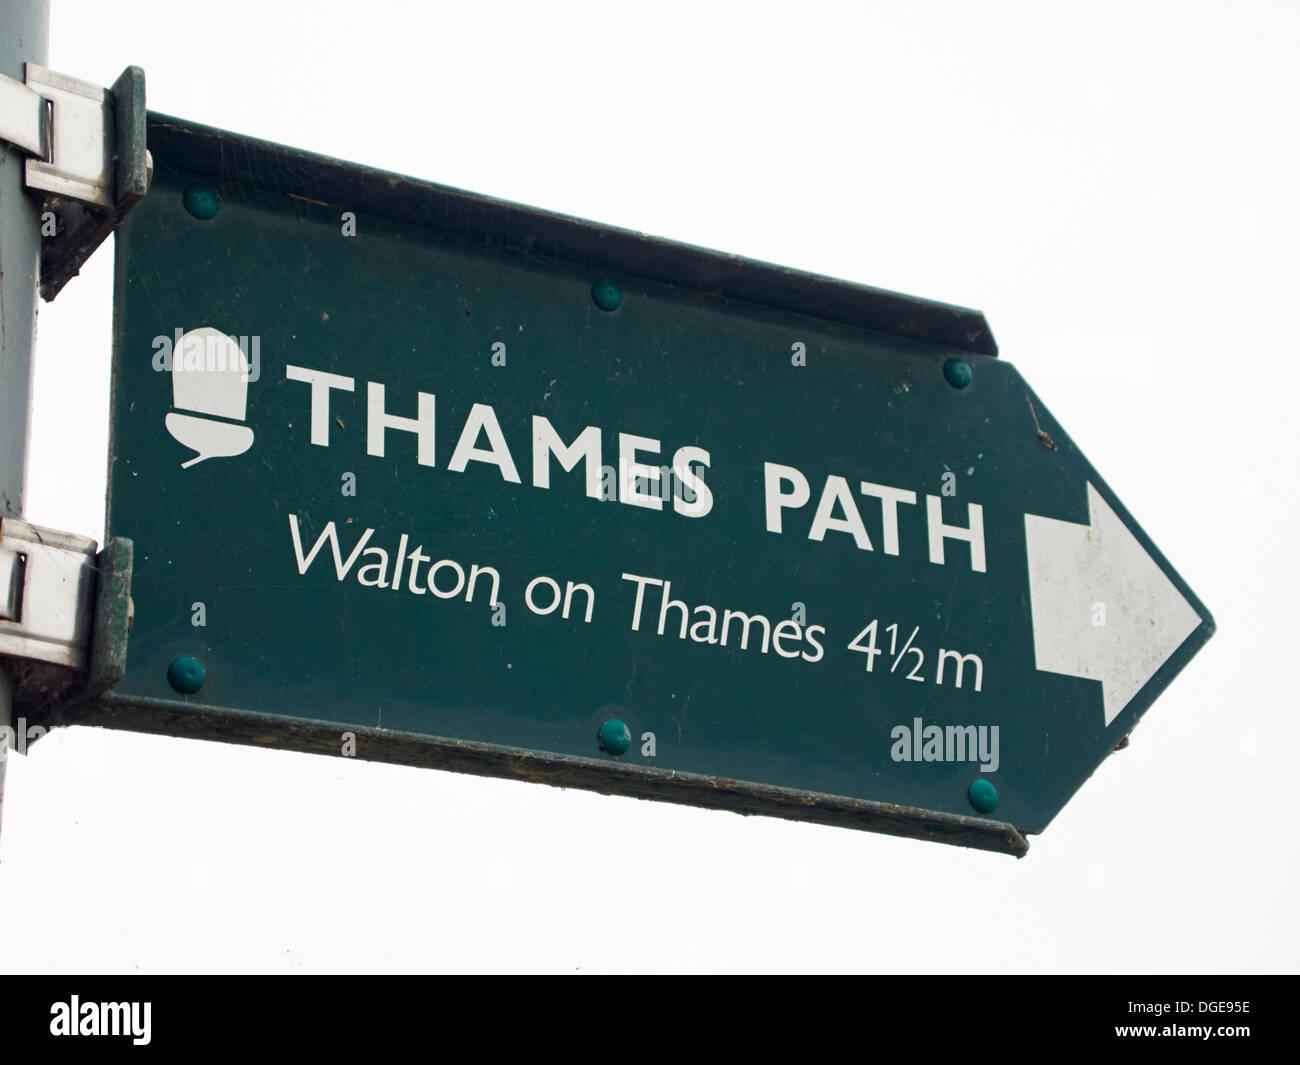 Thames Path sign, Walton on Thames 4 1/2 miles - Stock Image